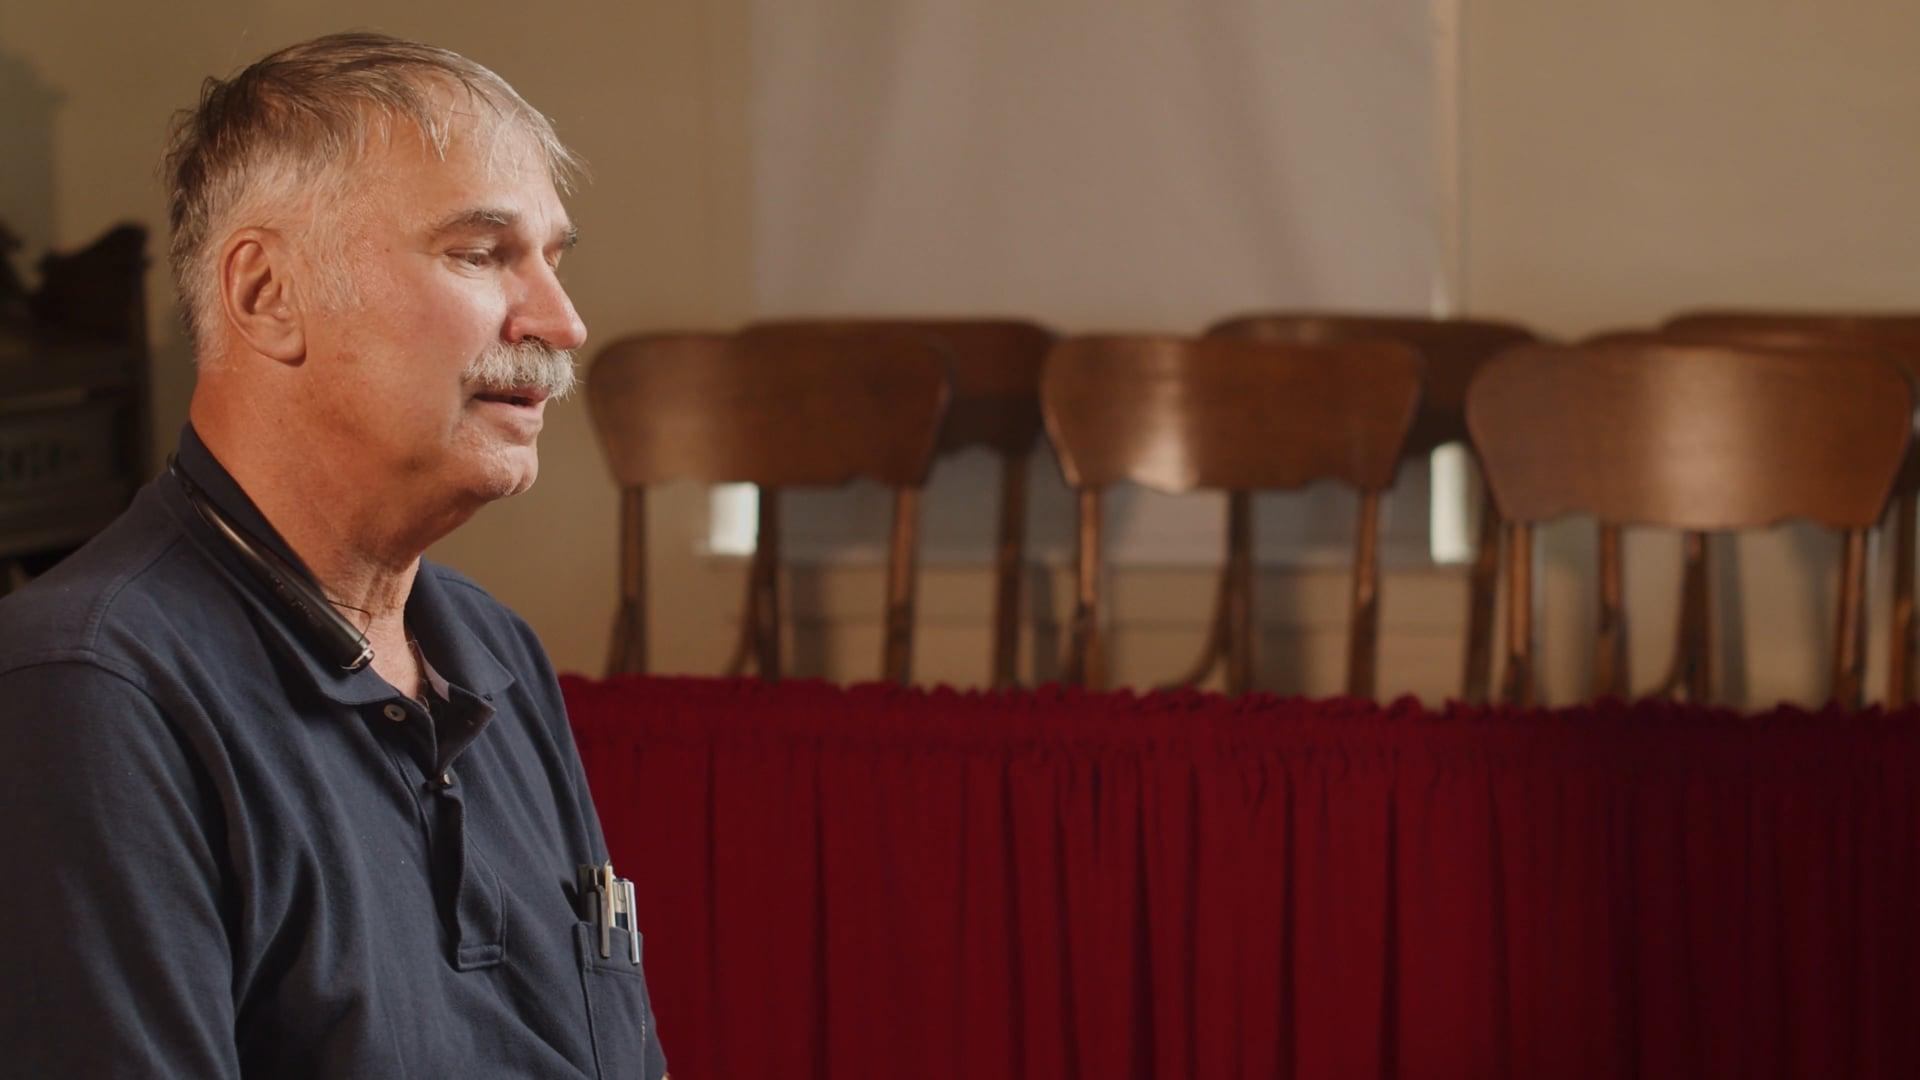 Ray Wiskur's Testimony